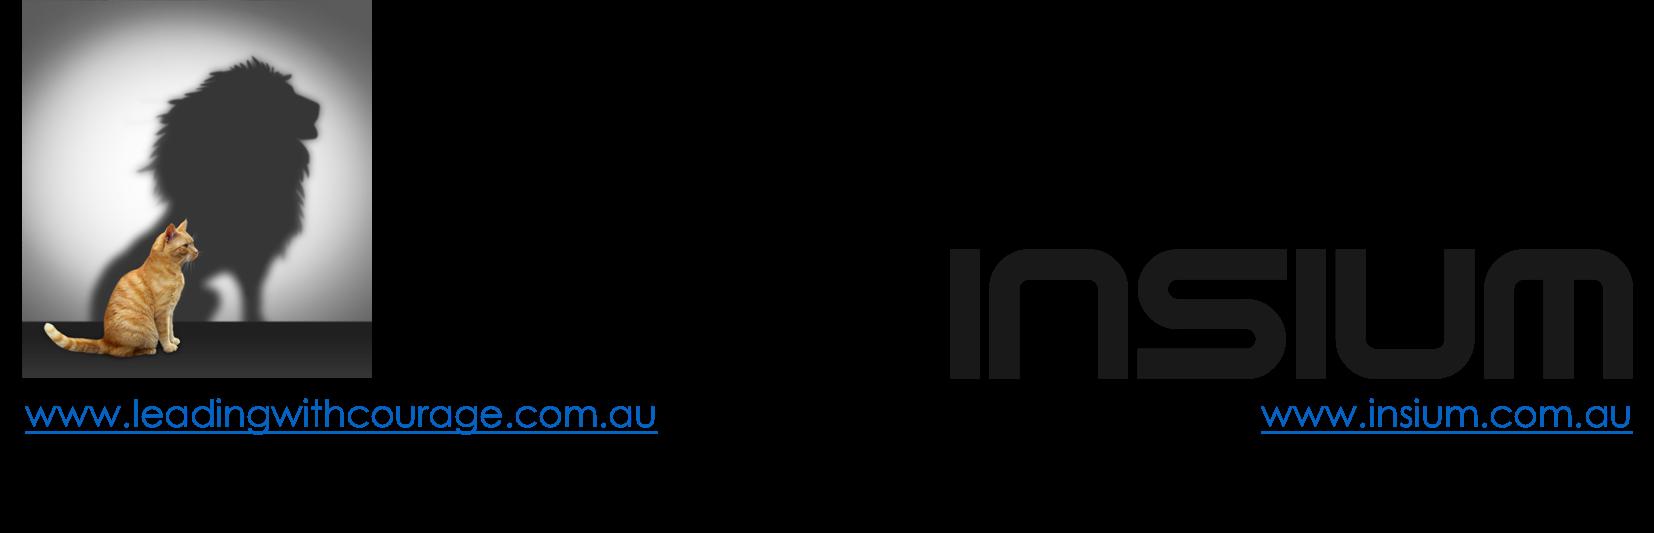 insium logo_interviews_blogs